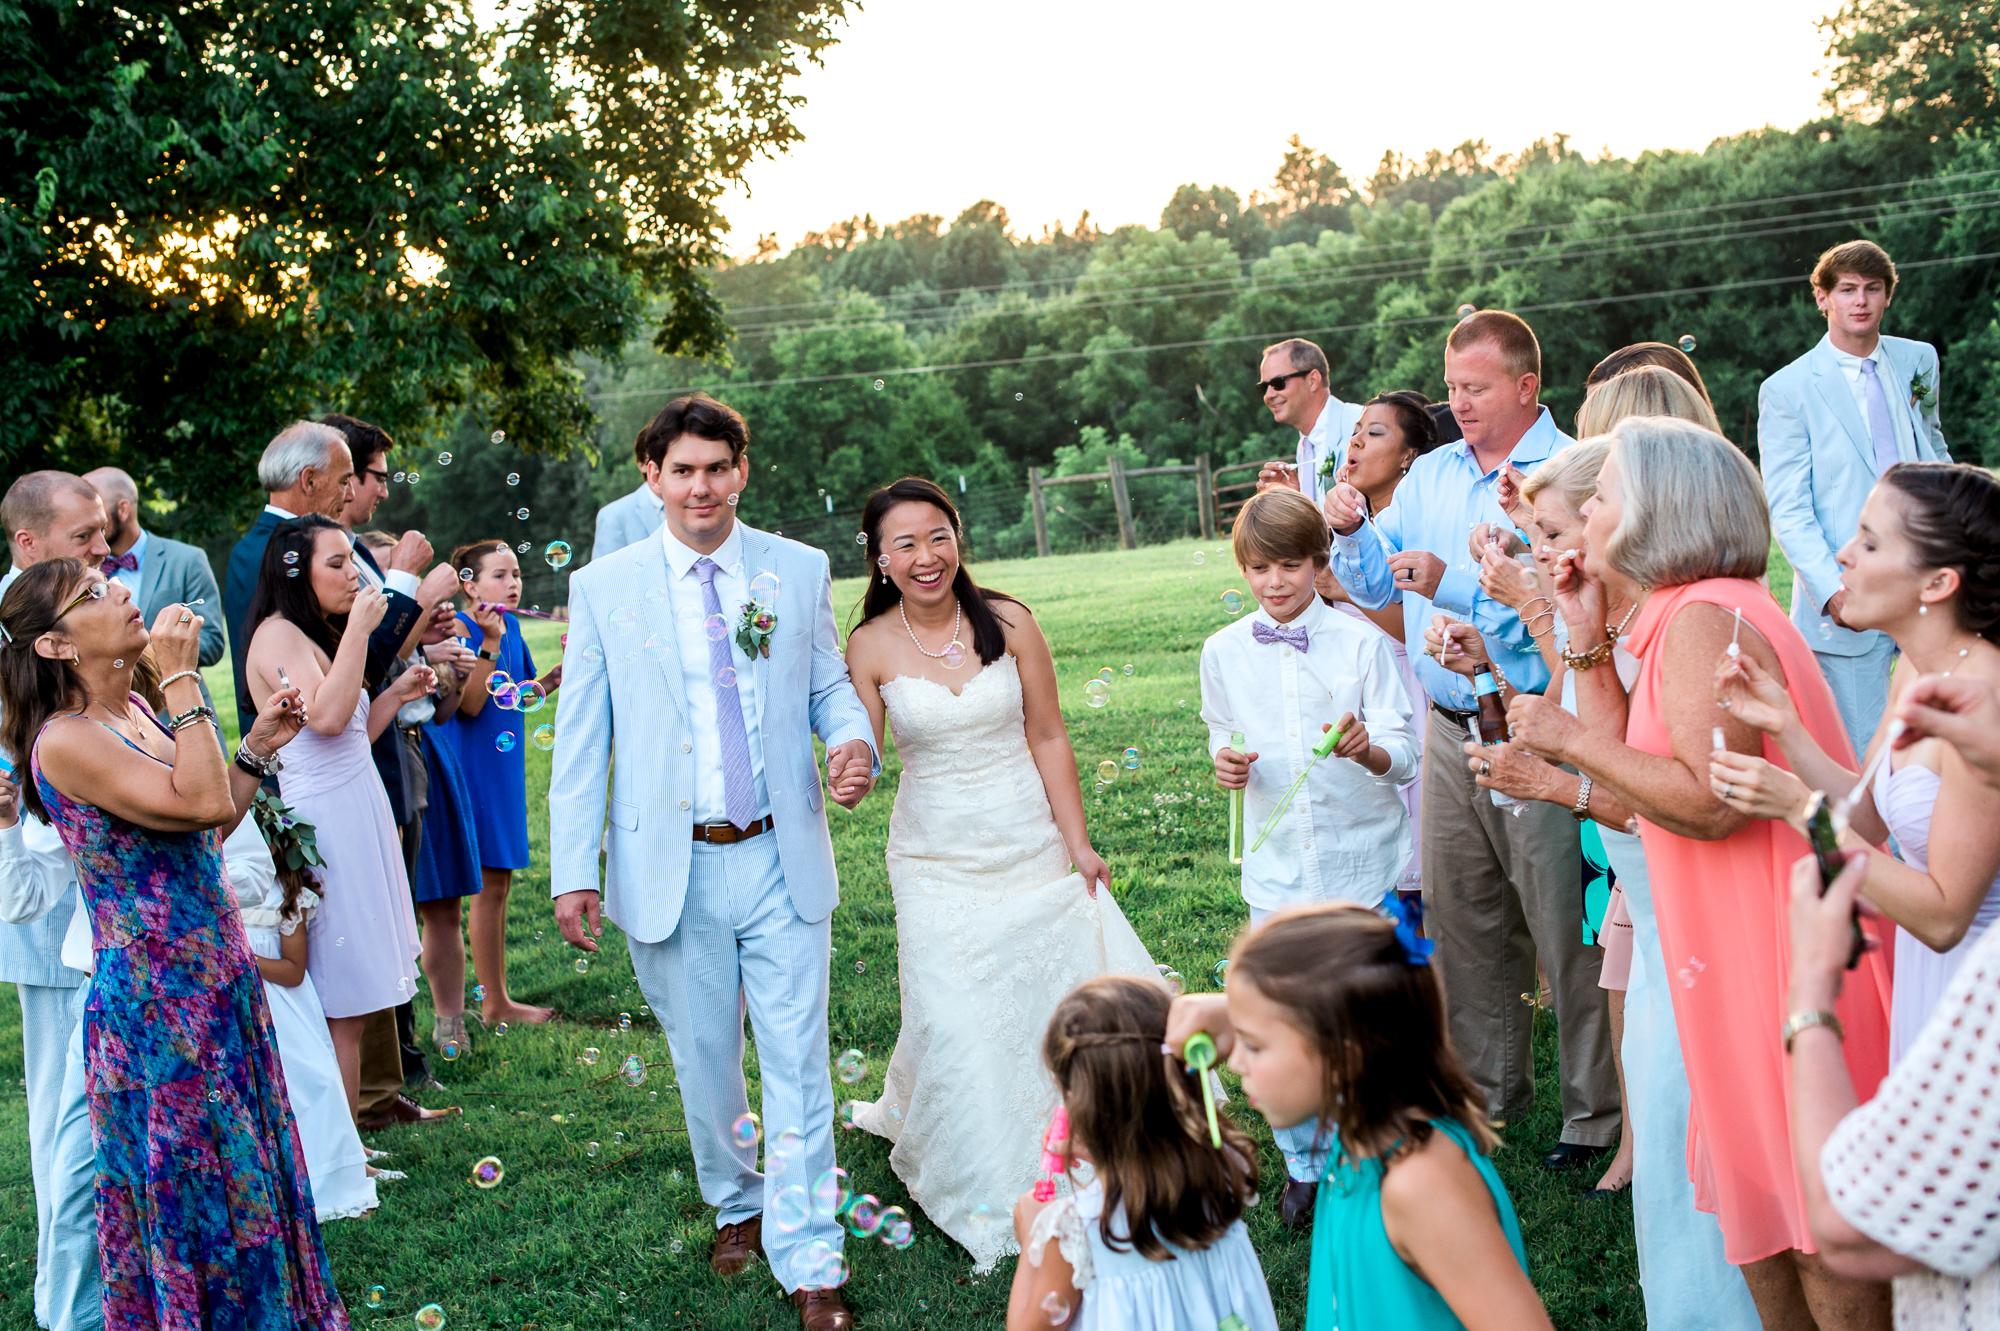 WEDDING VENUE FORT MILL, SC